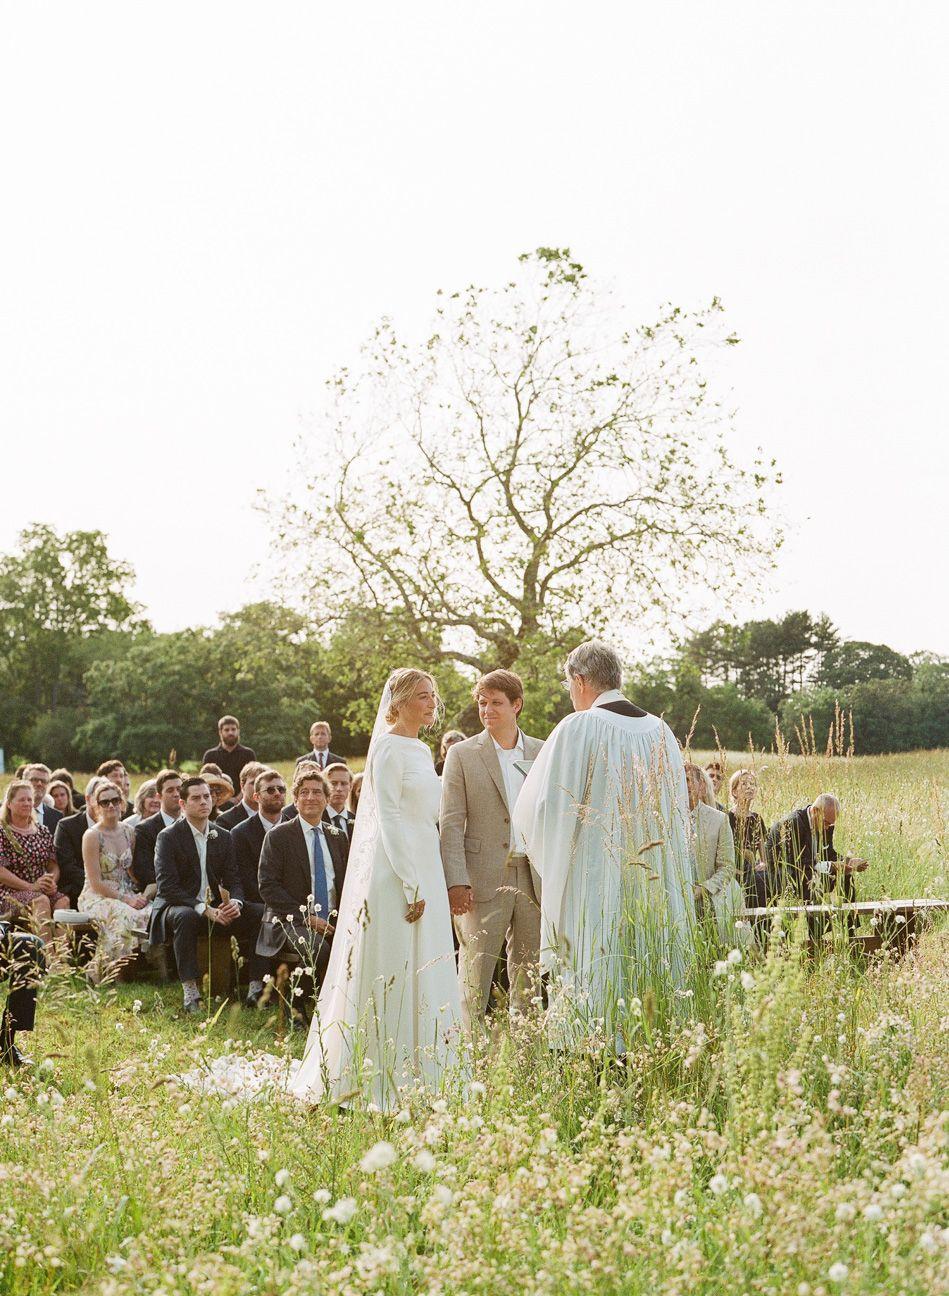 KareHillPhotography-Nassikas-Wedding-0533.jpg